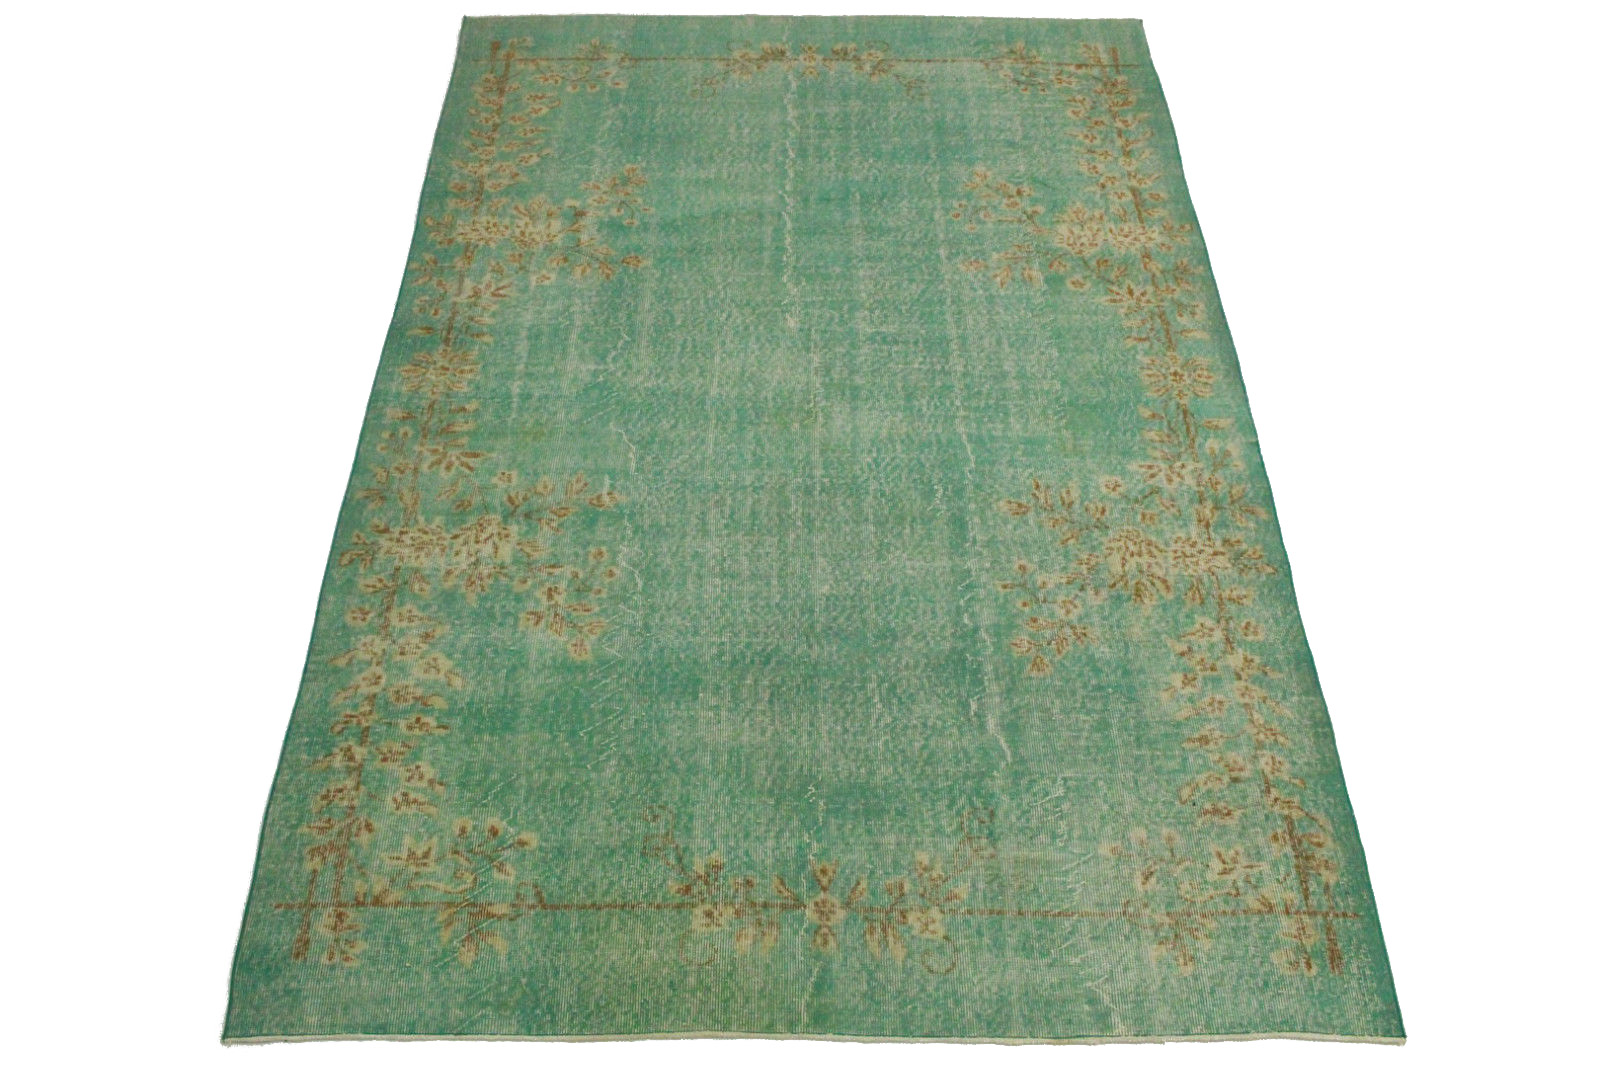 vintage teppich gr n t rkis in 310x200cm 1011 5128 bei kaufen. Black Bedroom Furniture Sets. Home Design Ideas